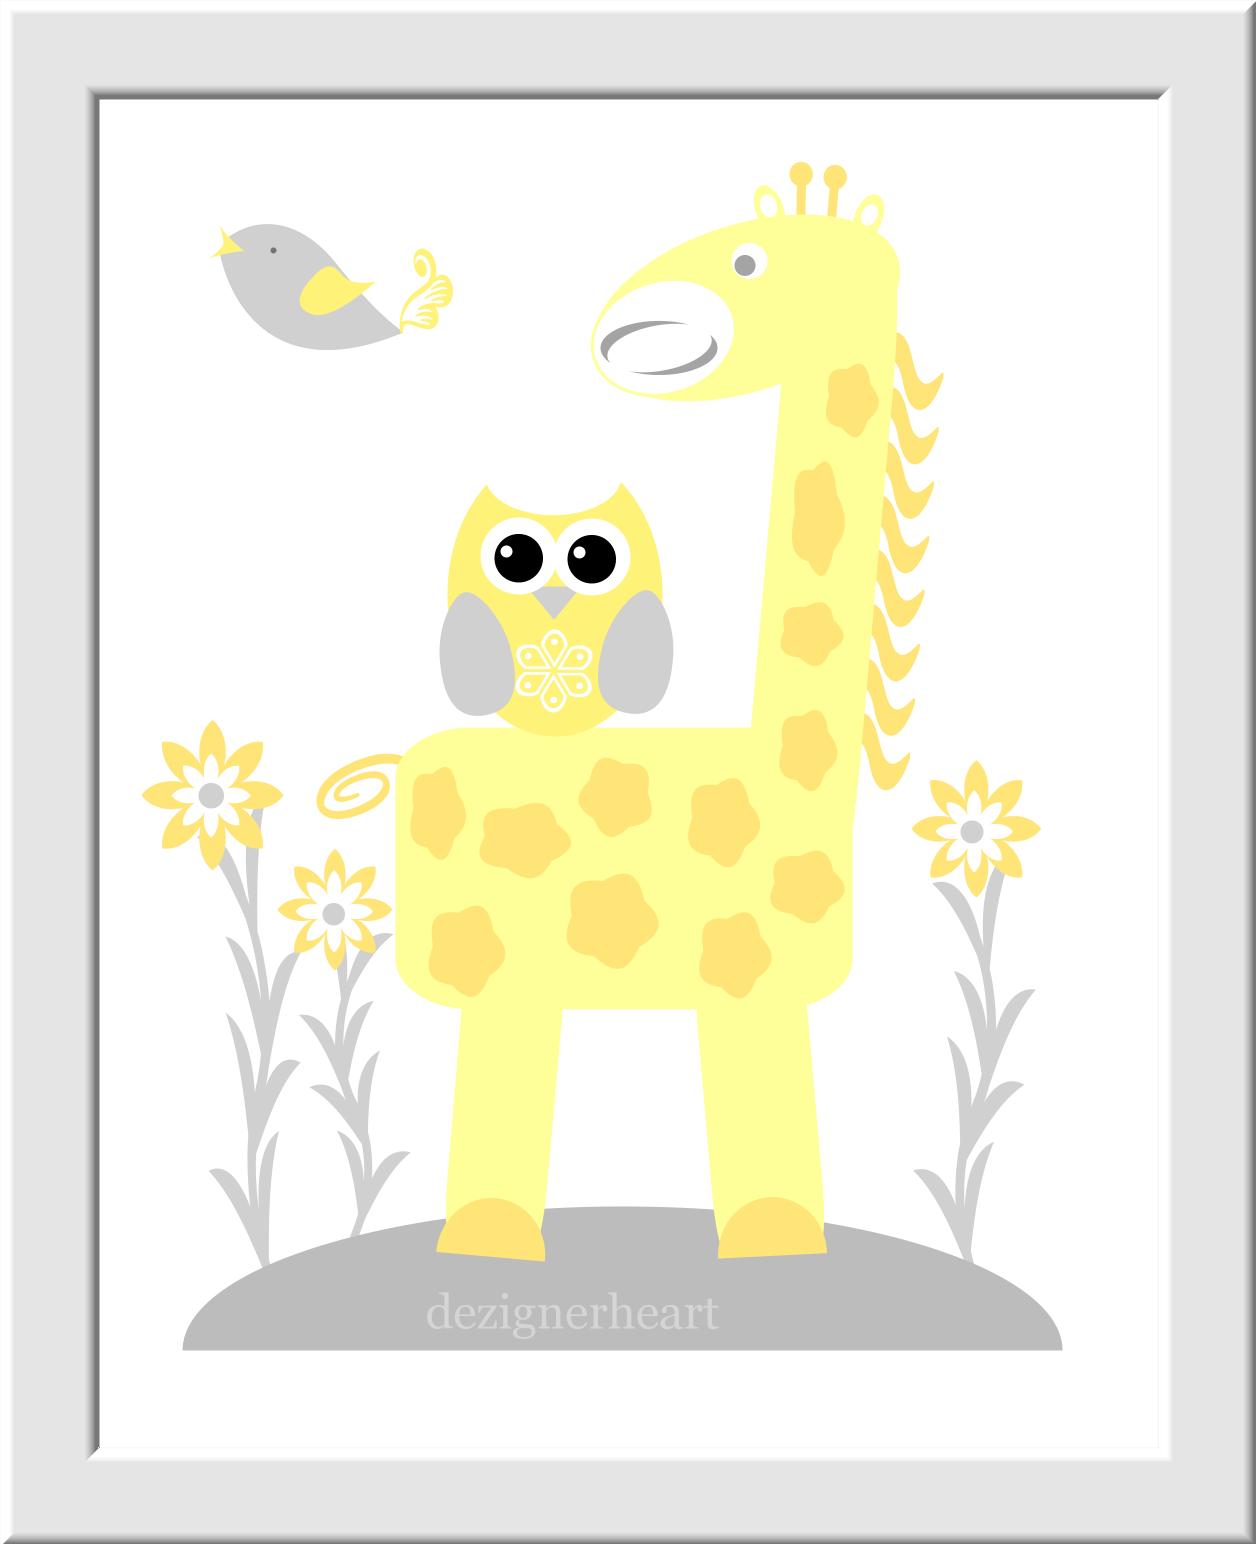 Personalized Baby Nursery Wall Art Gray Yellow Grey Elephant Giraffe ...